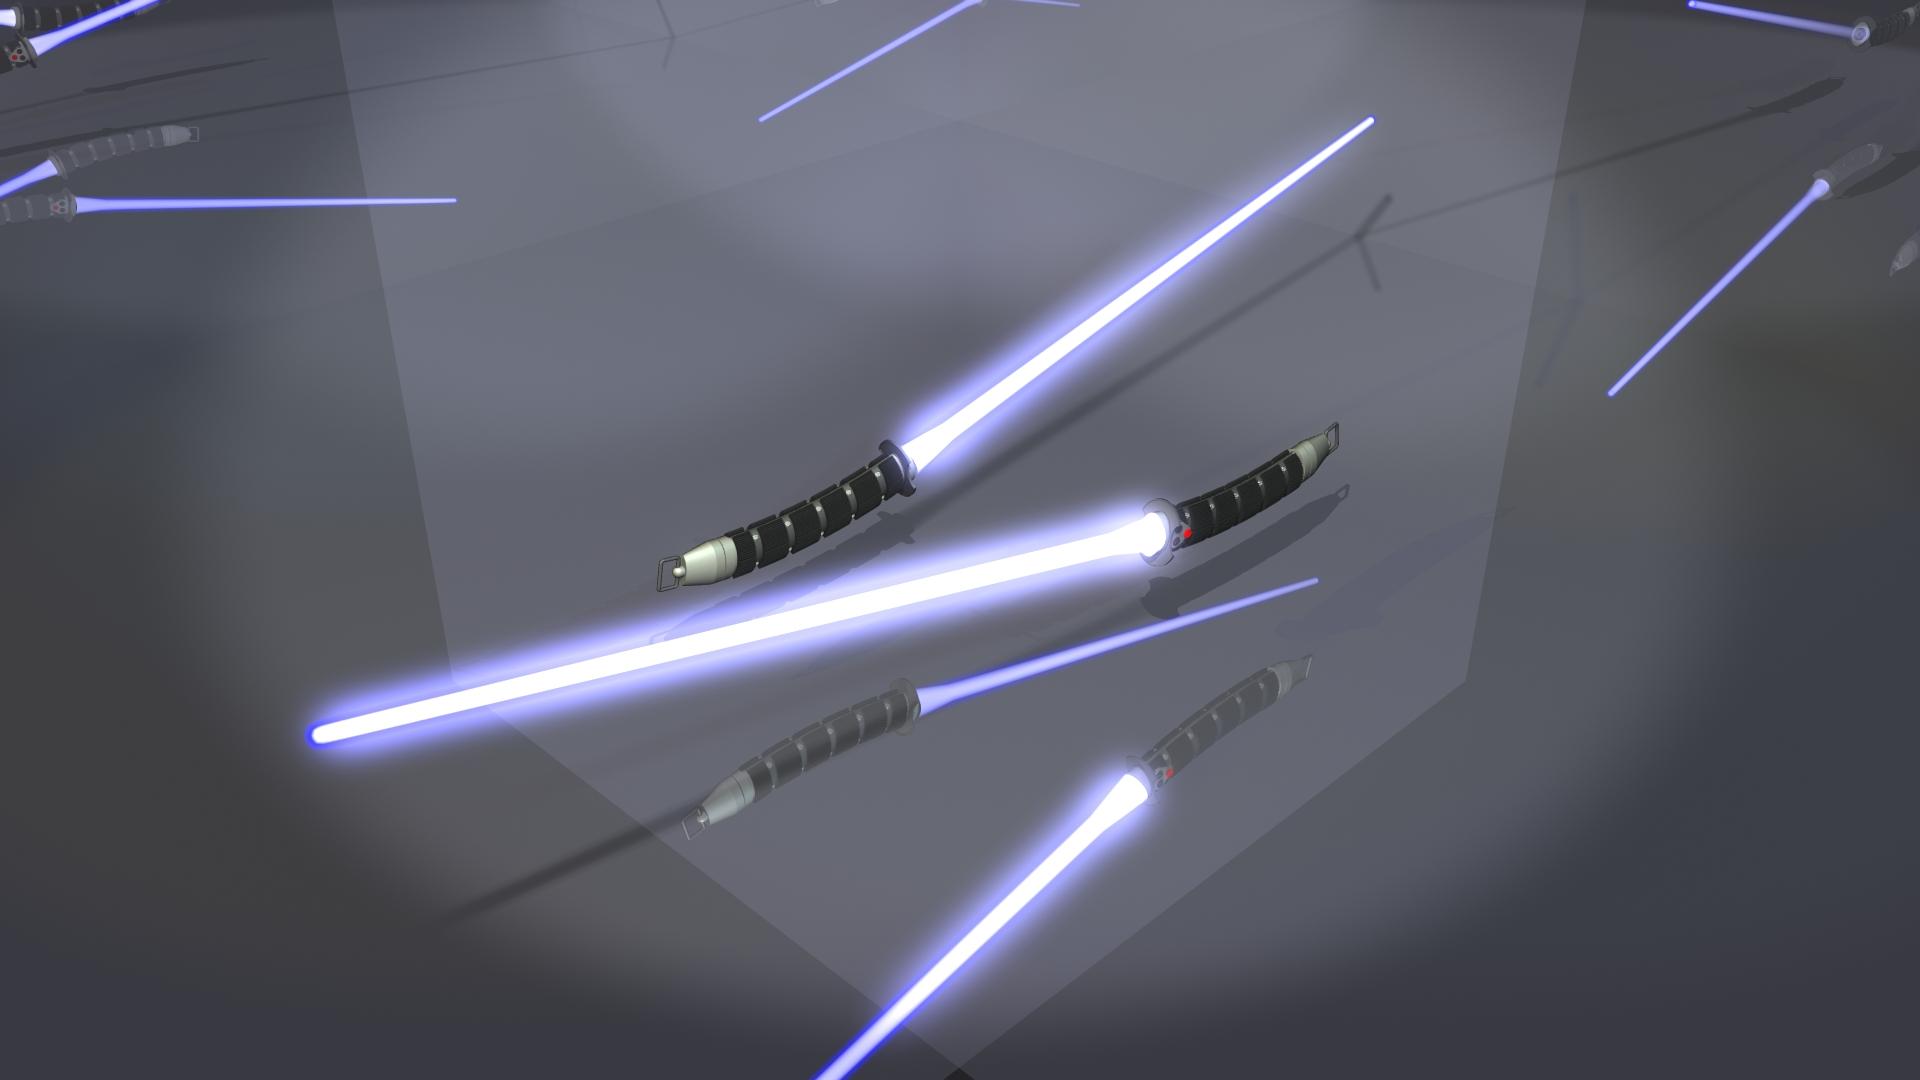 Star Wars Light Up Lightsaber Katana Lightsaber On by xgothshadowx on DeviantArt